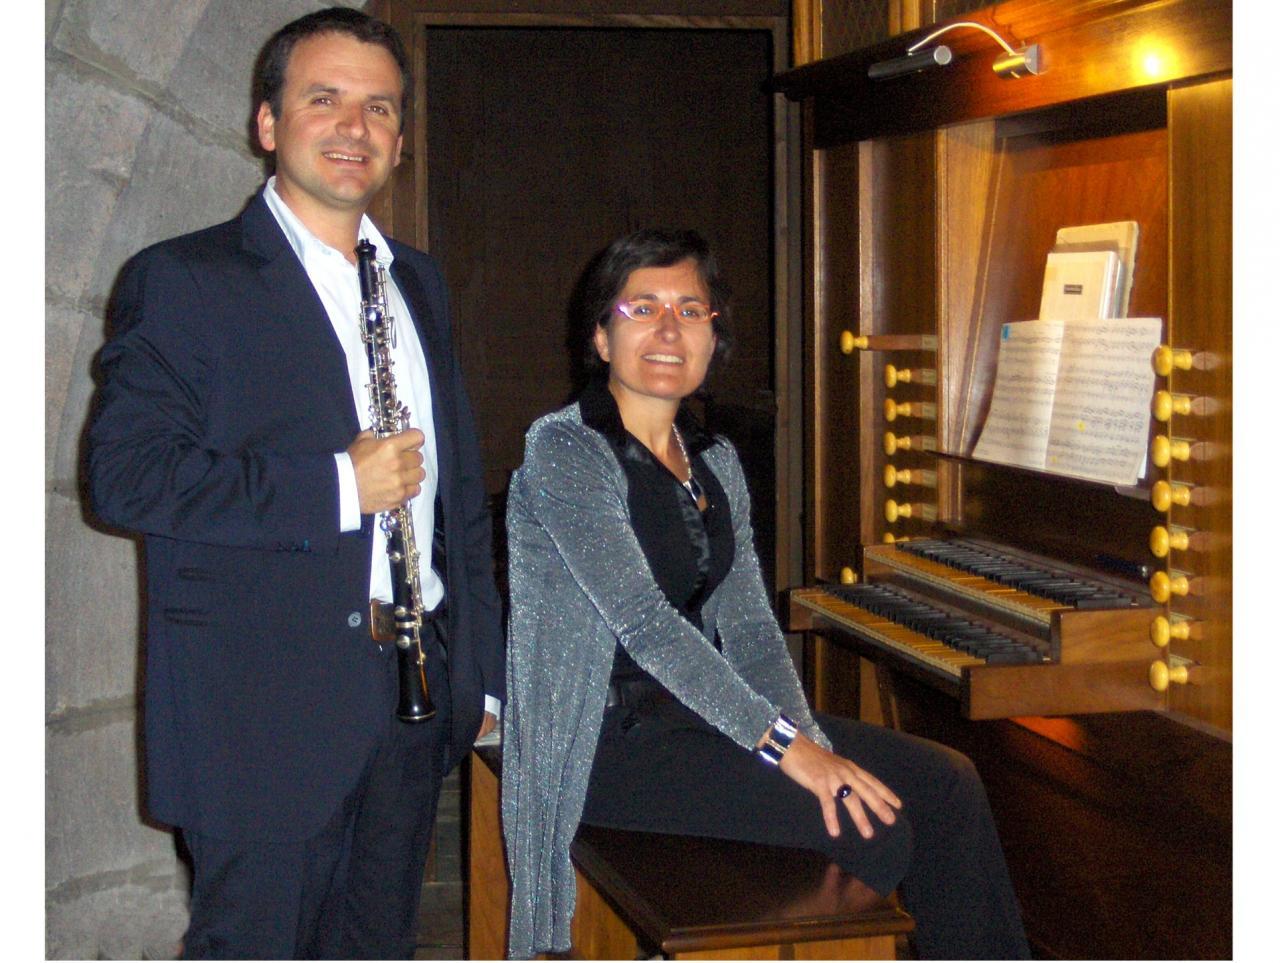 mai 2011: Hautbois et orgue